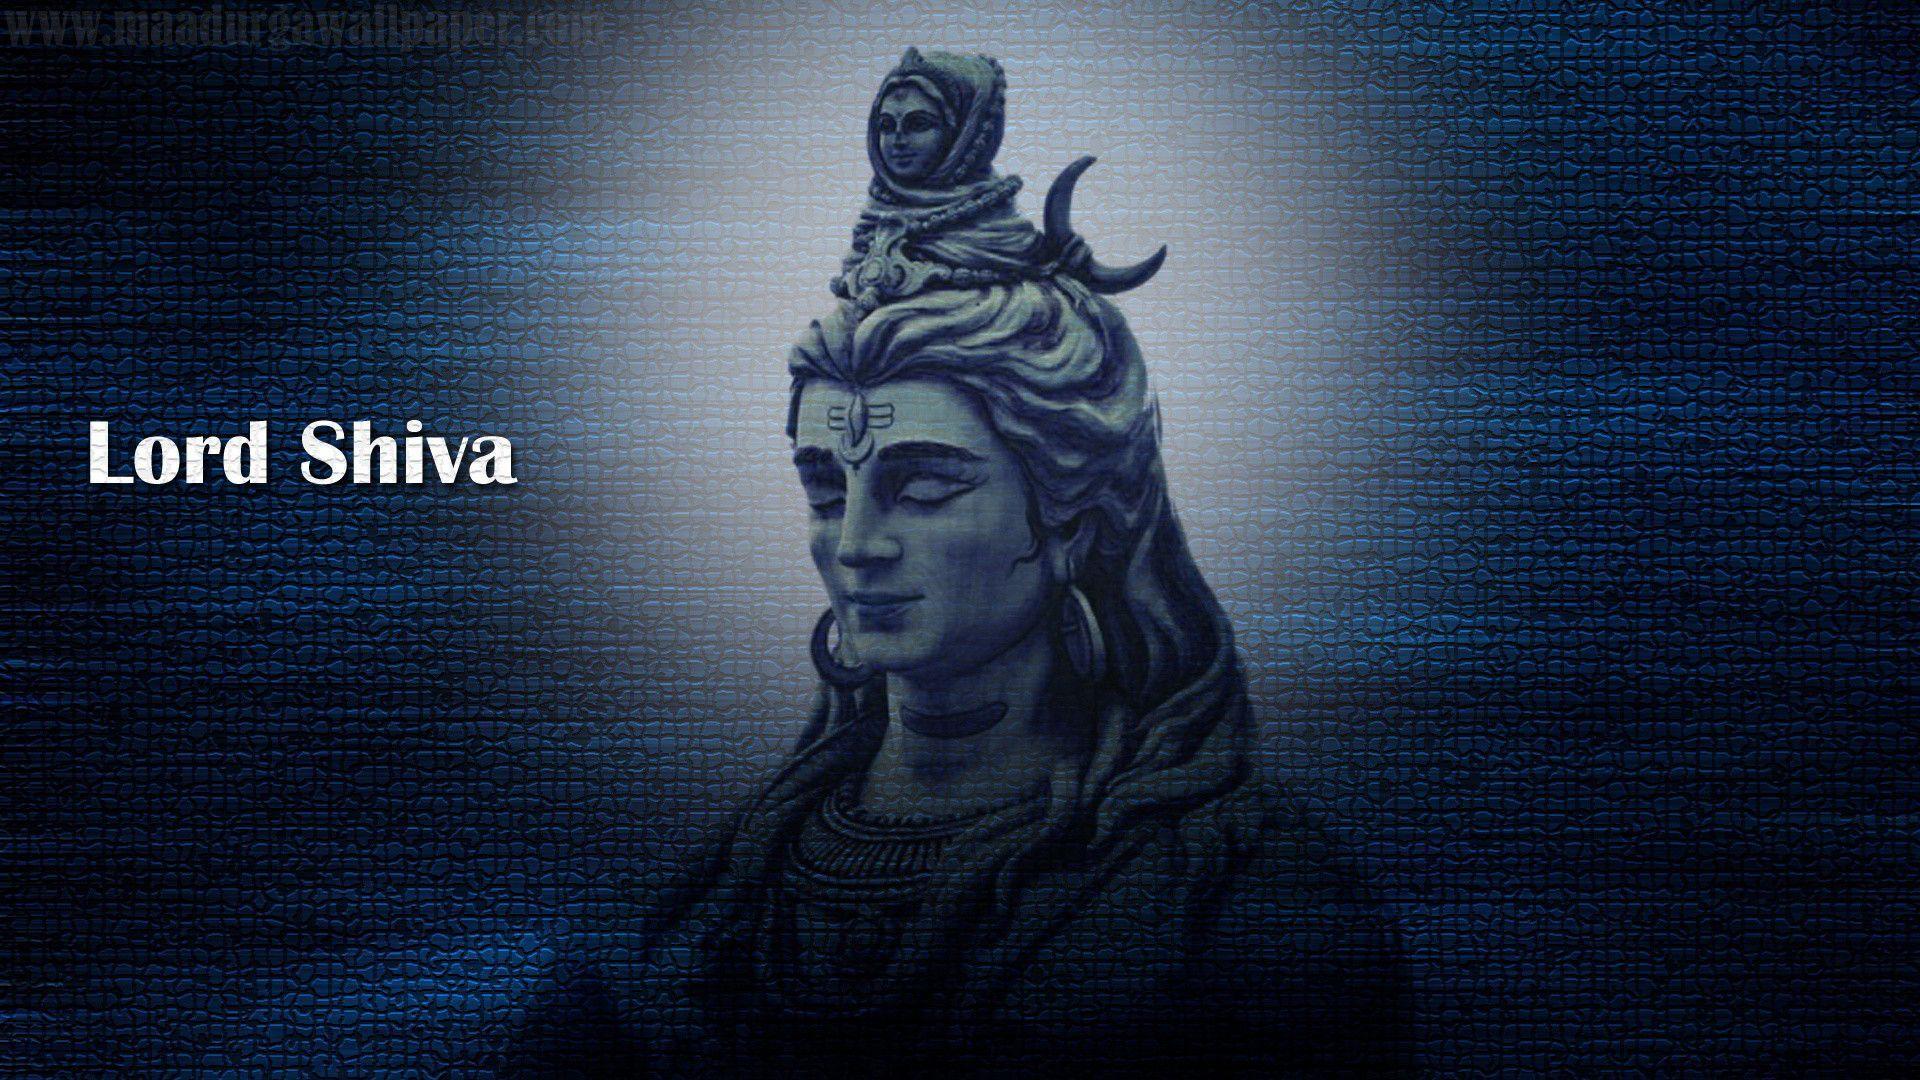 Hindu God HD Wallpapers 1080p Hd wallpapers 1080p, Hd